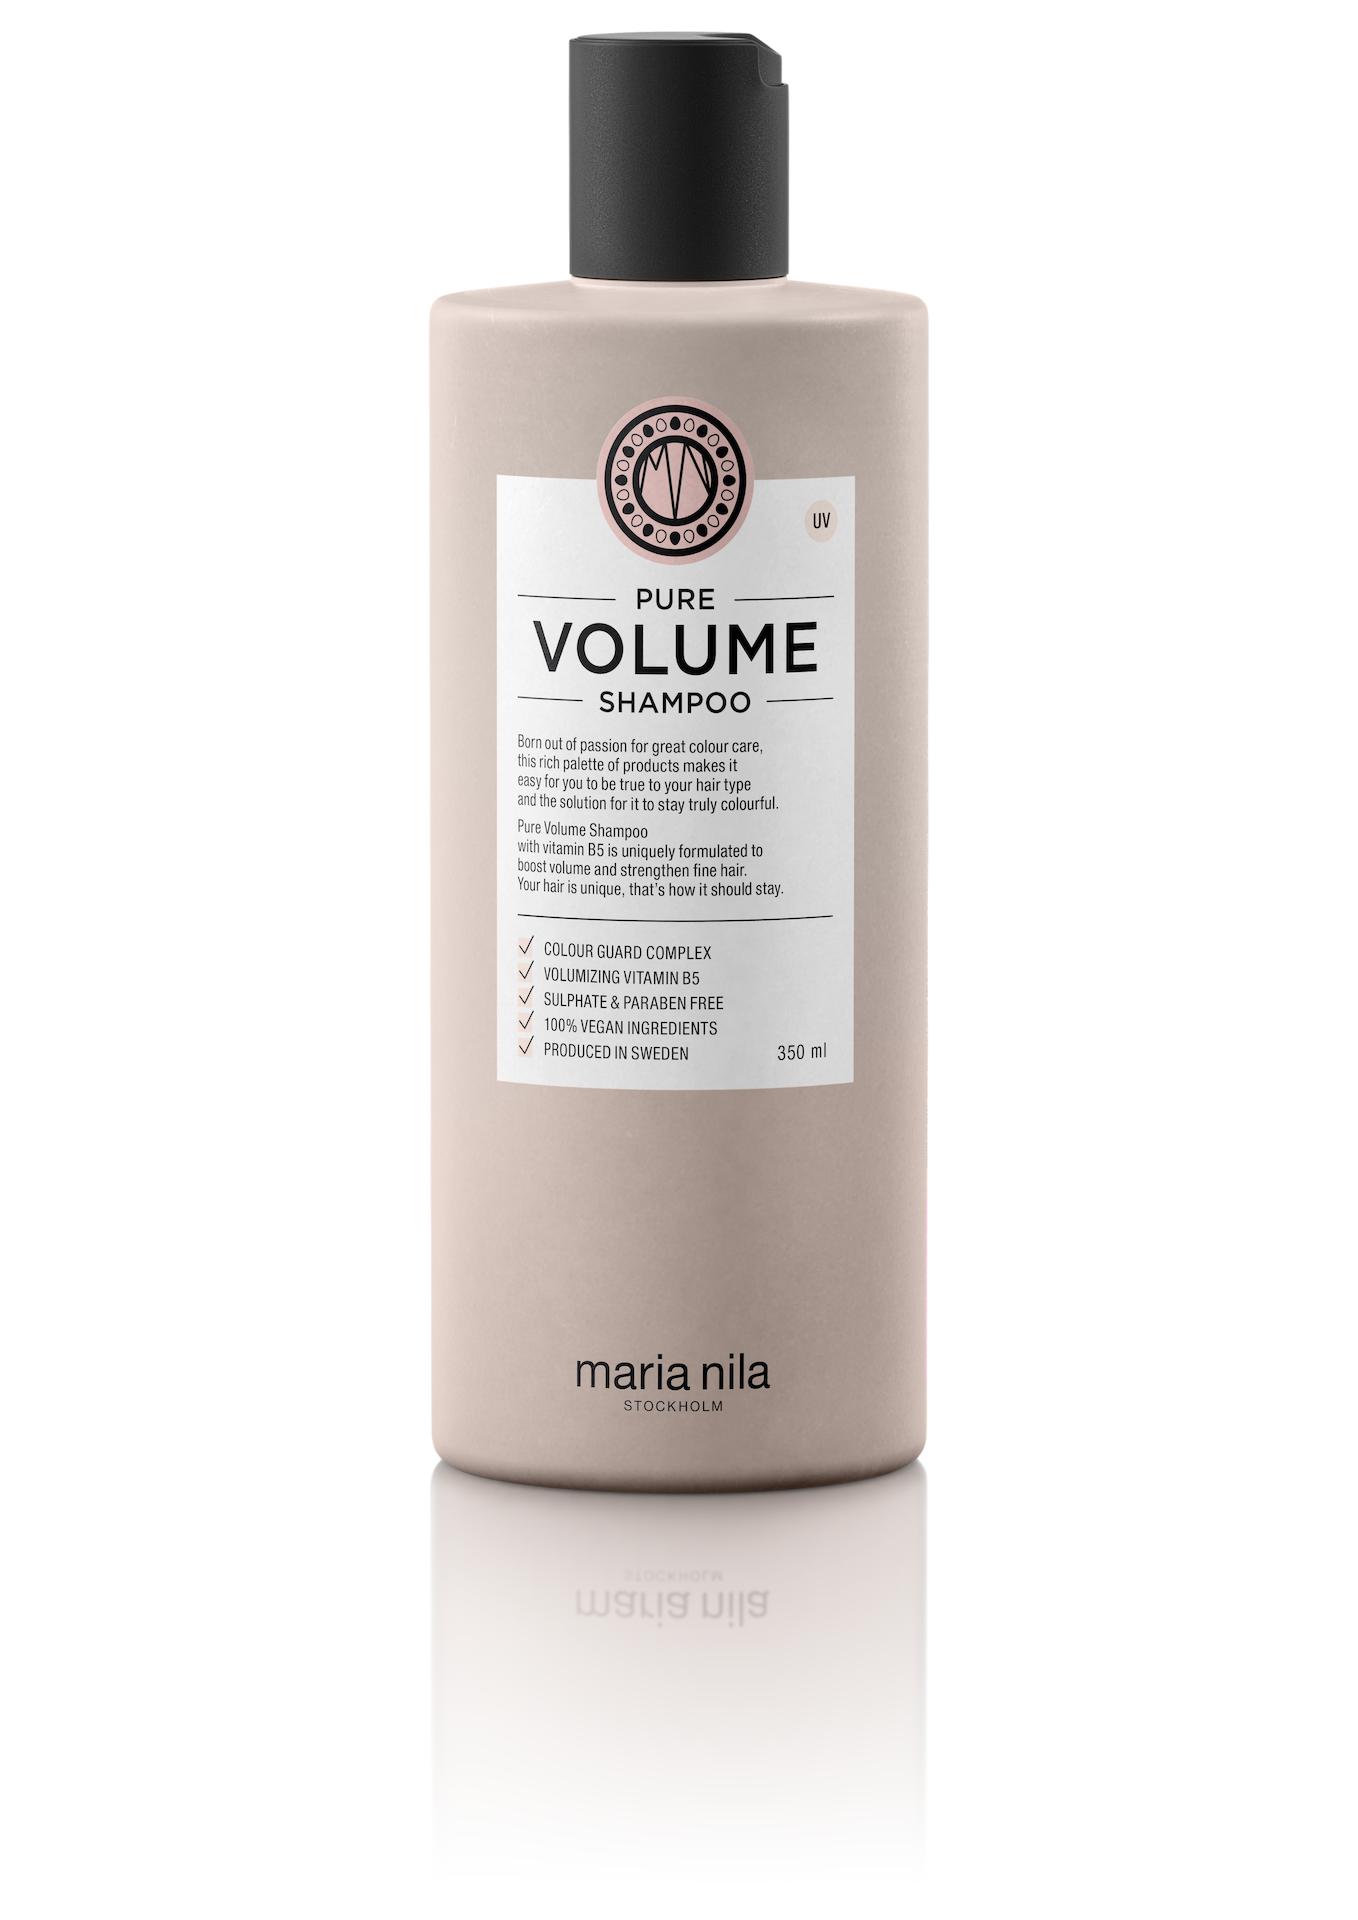 Pure Volume Shampoo 350ml